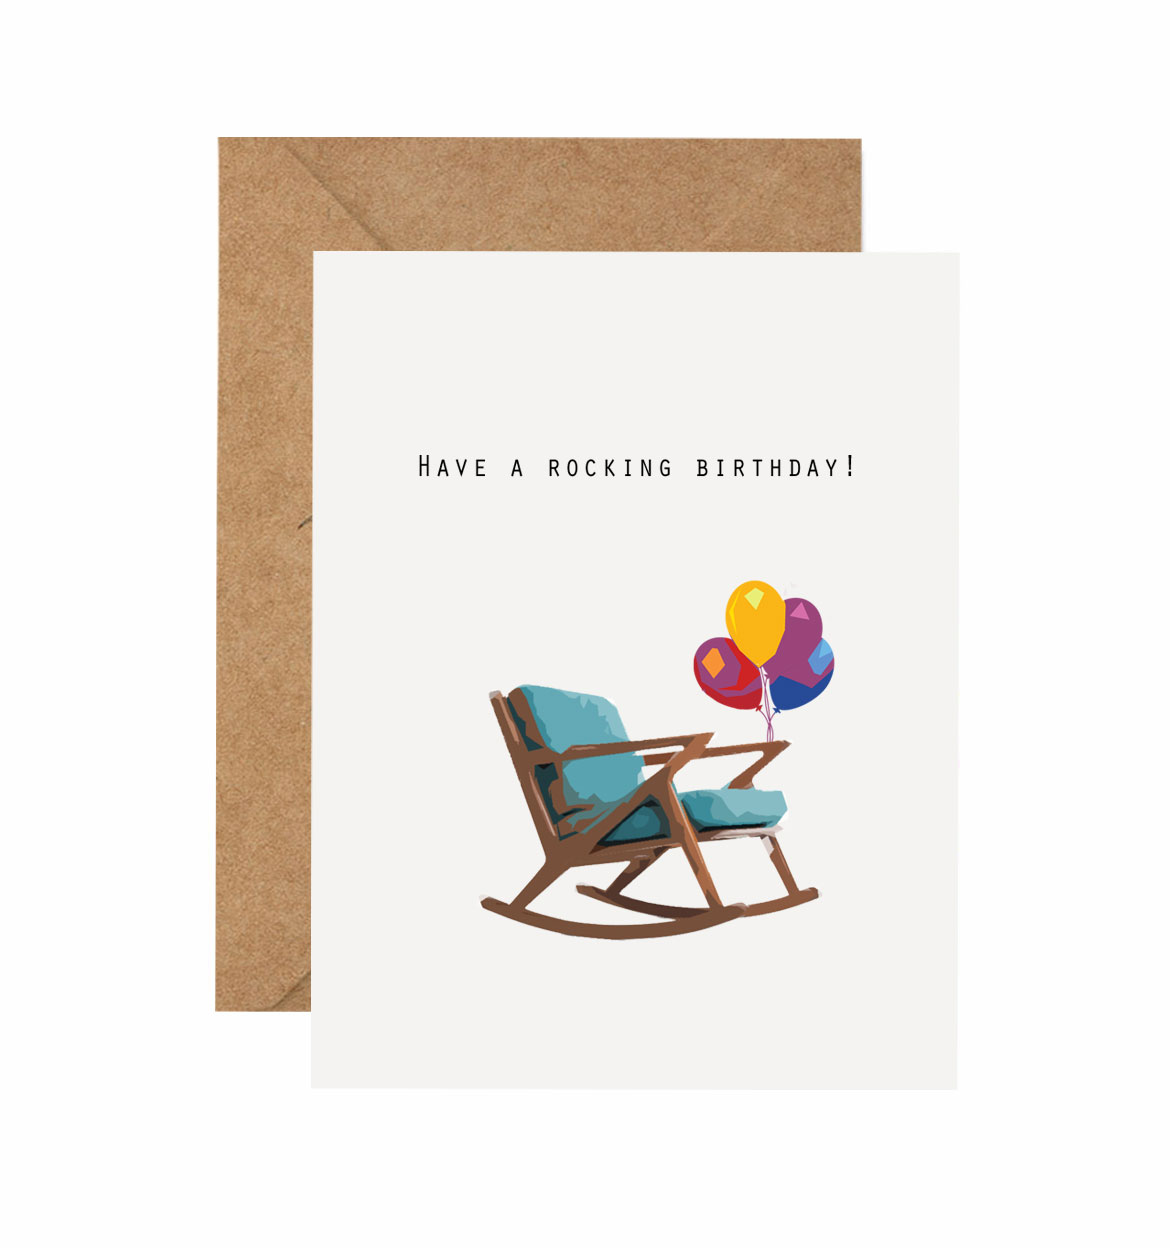 rocking-chair-happy-birthday-telamoda-greeting-cards